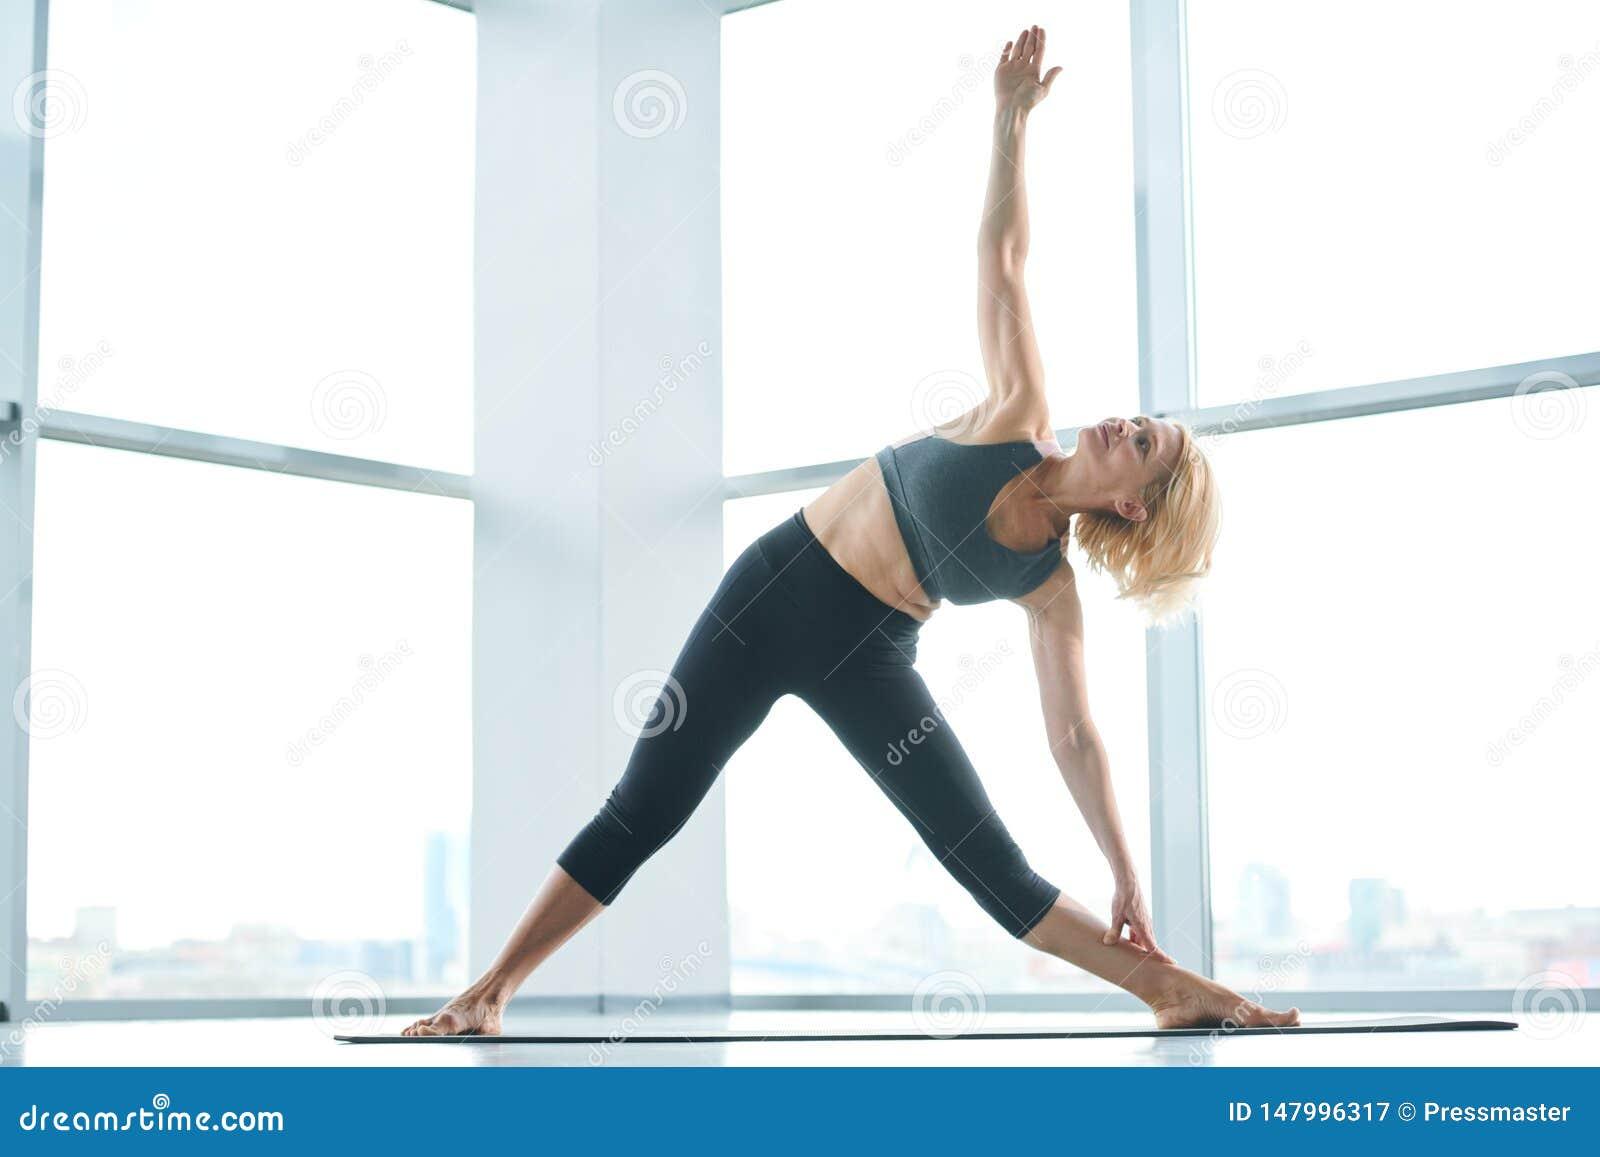 Woman side-bending